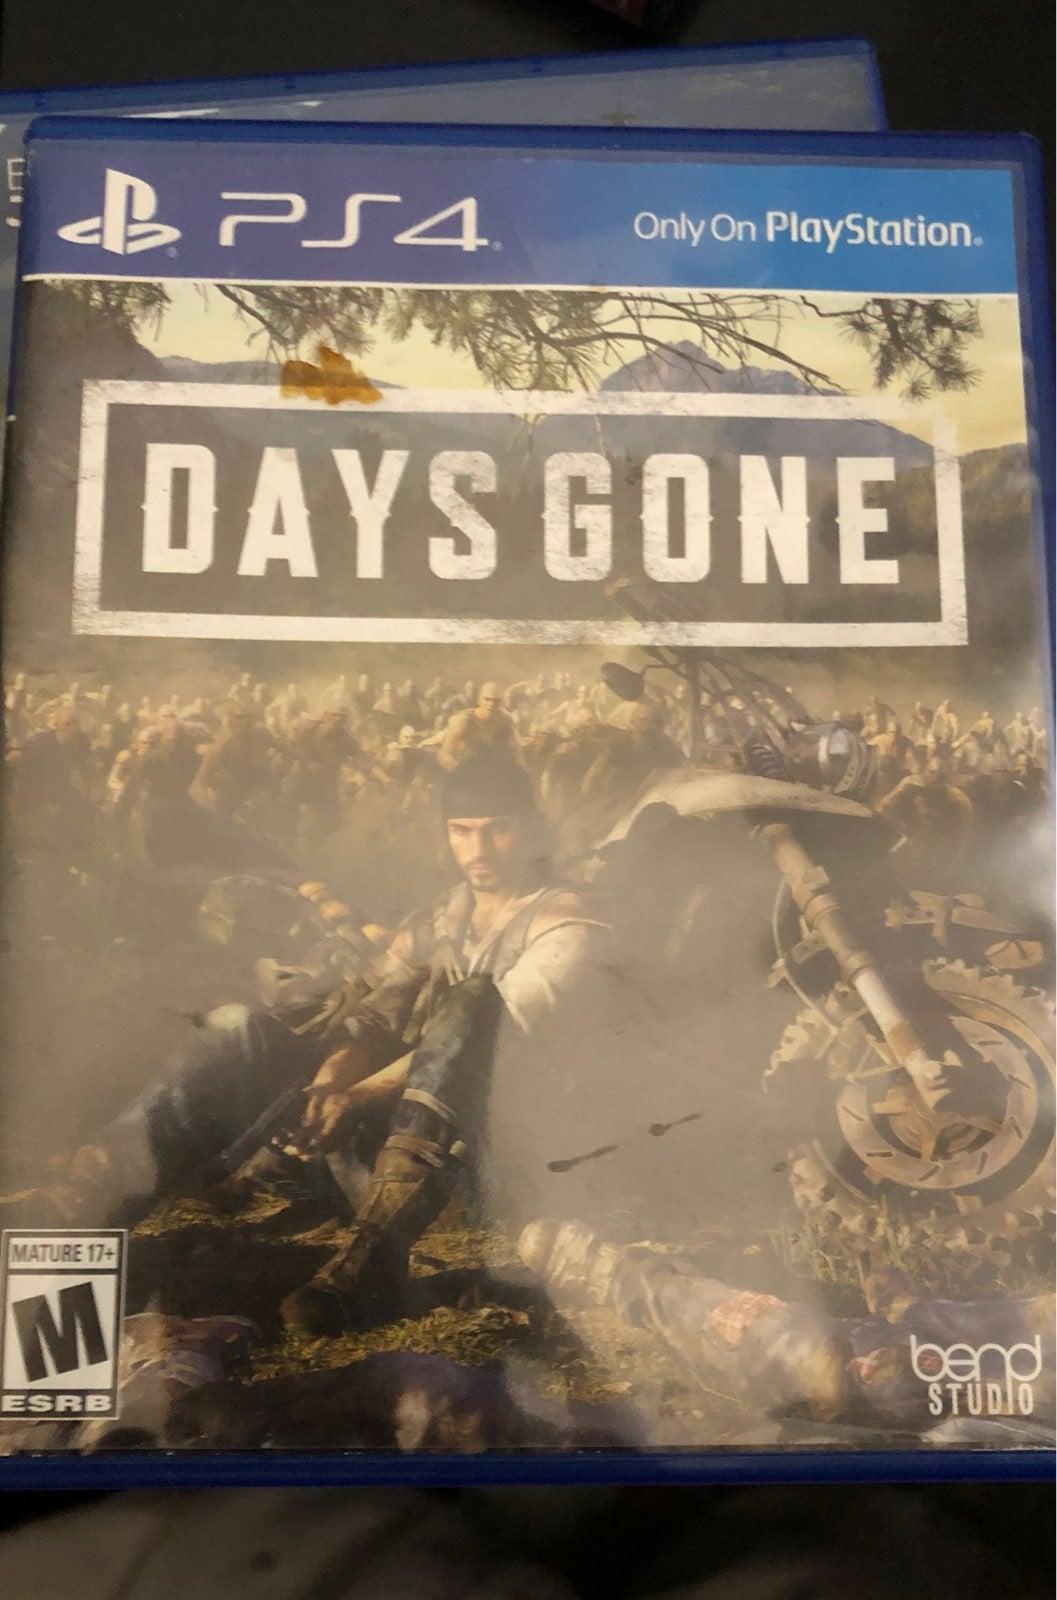 Days Gone on Playstation 4